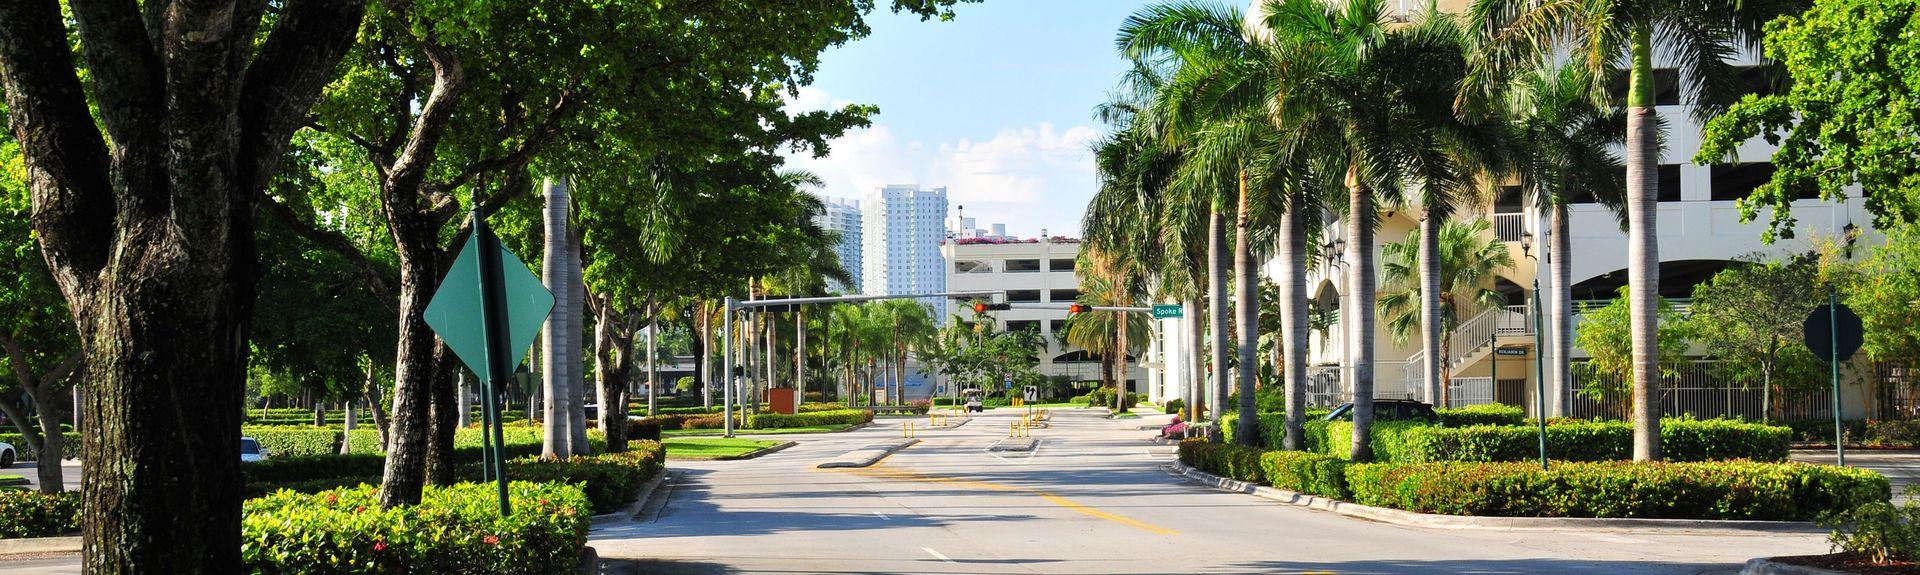 Aventura, Flórida, Estados Unidos